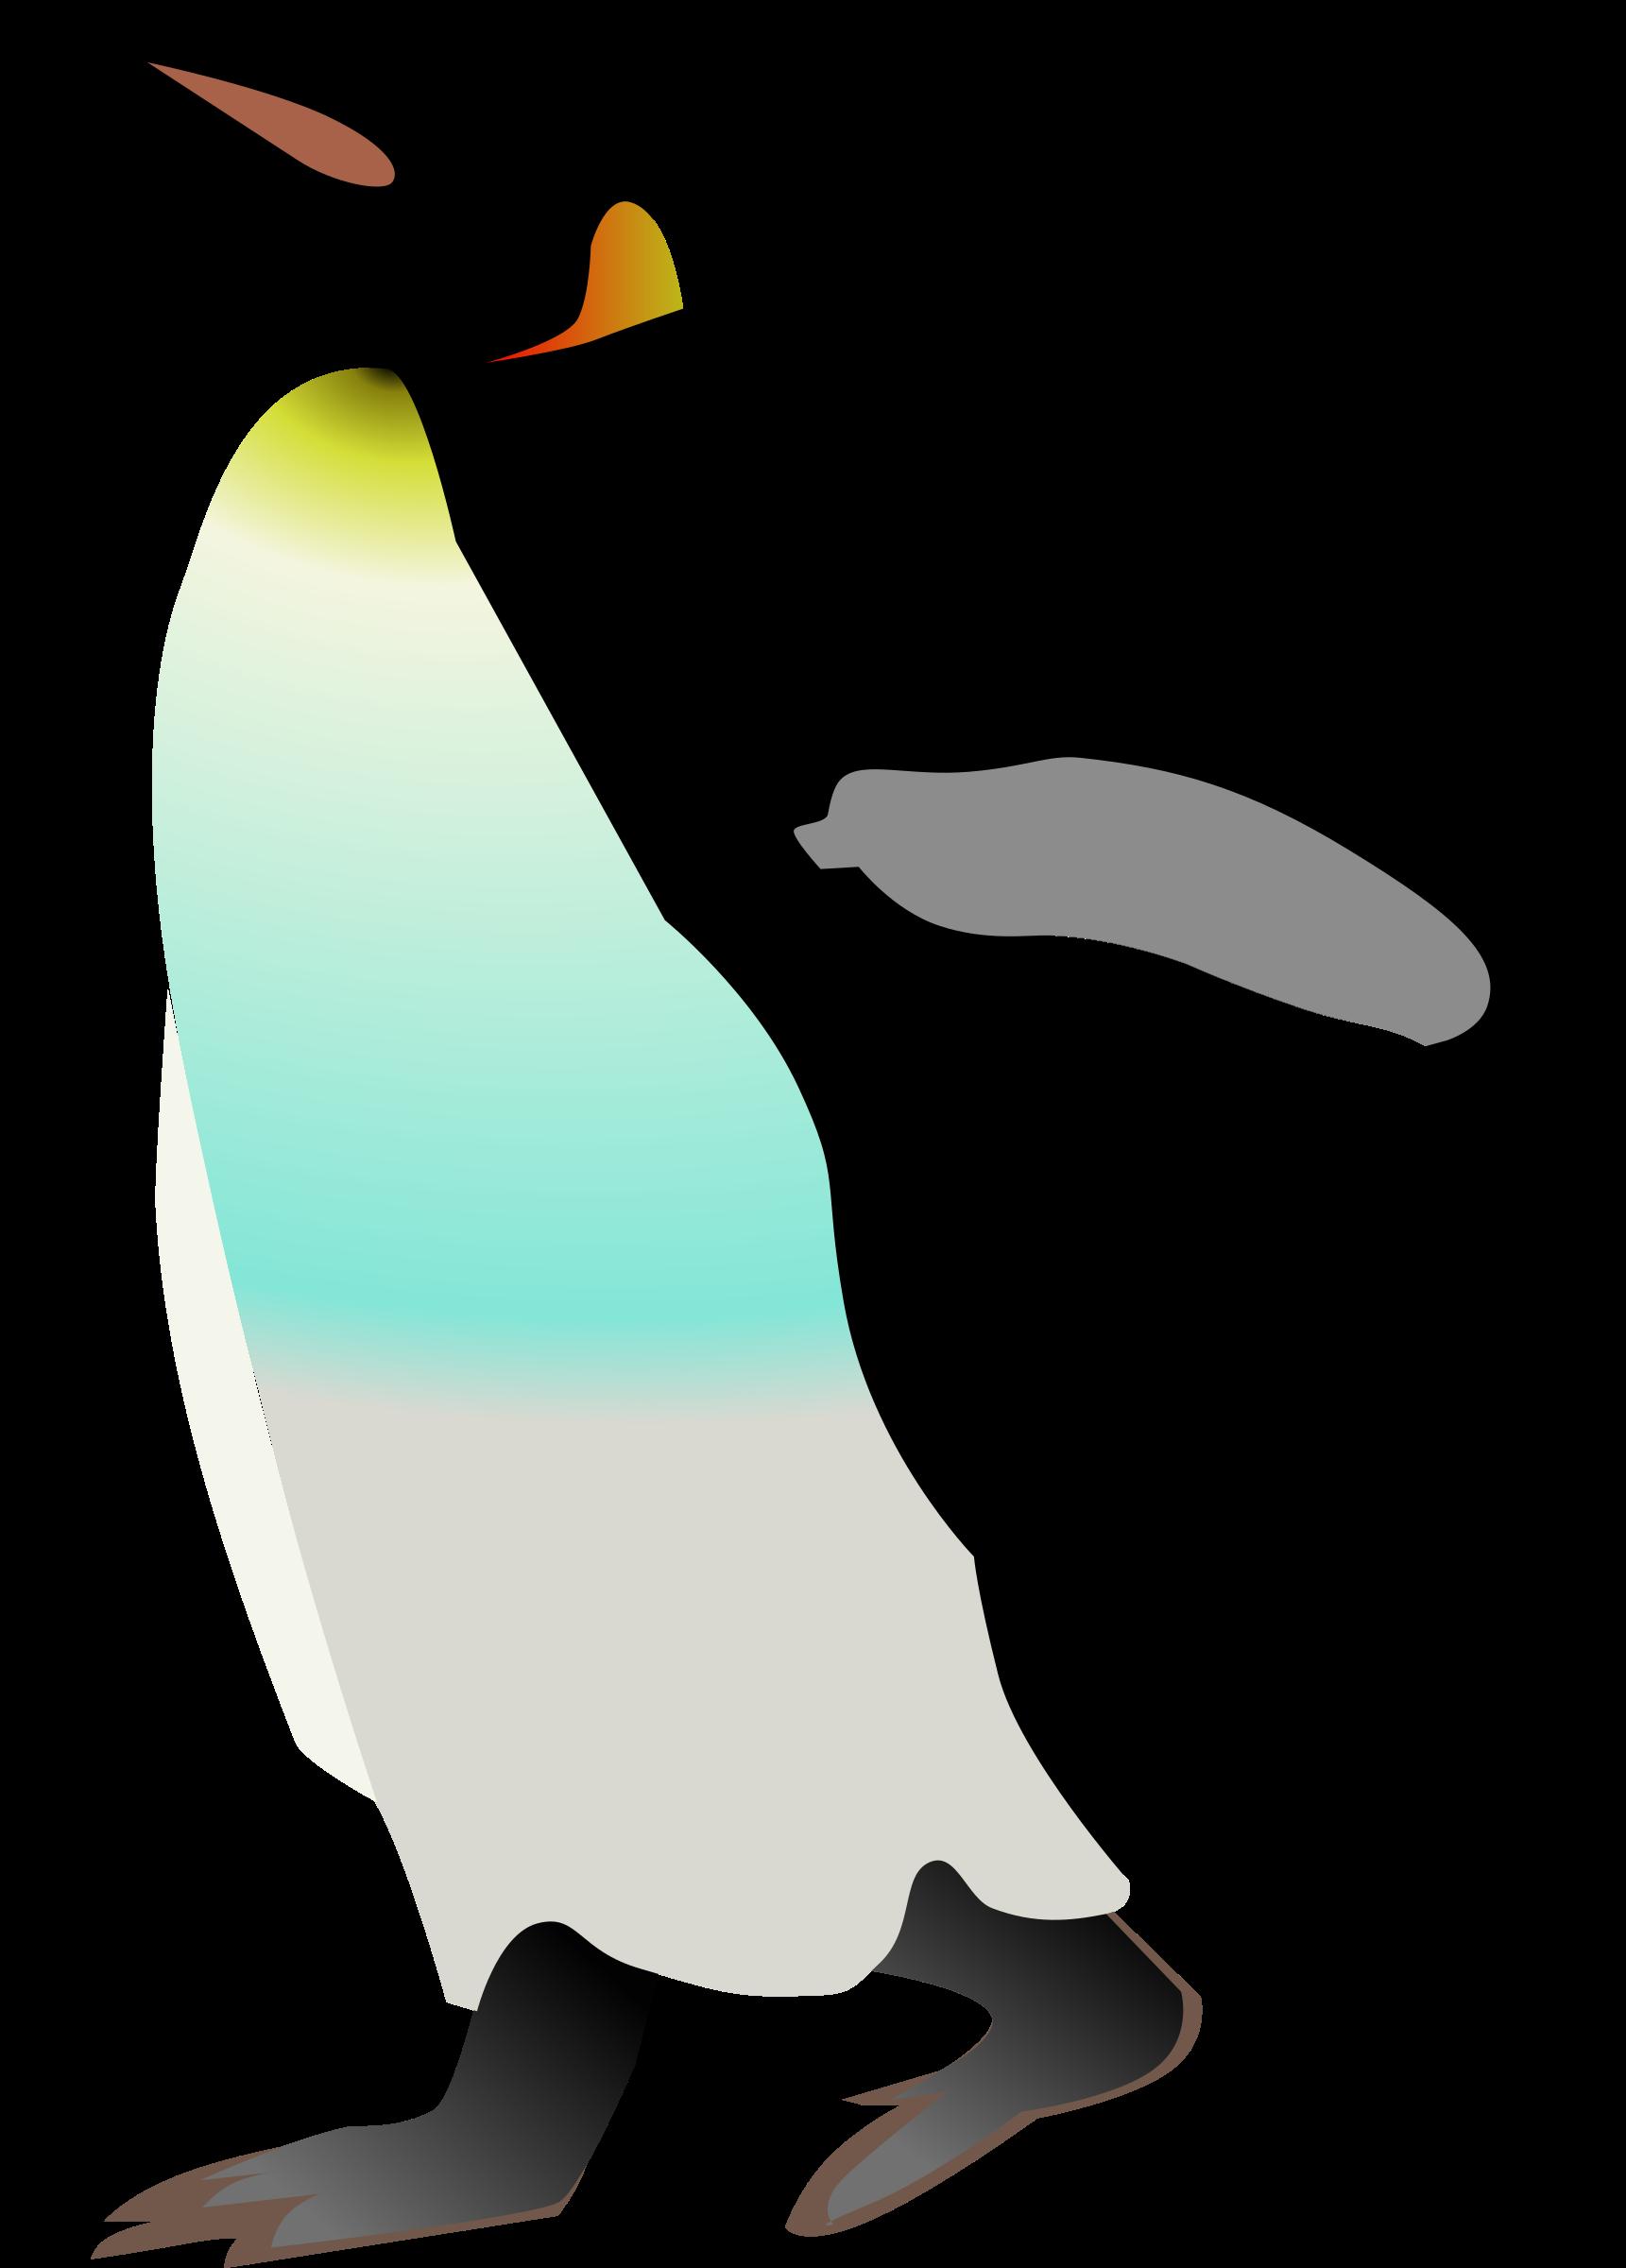 Big image png. Clipart penguin emperor penguin